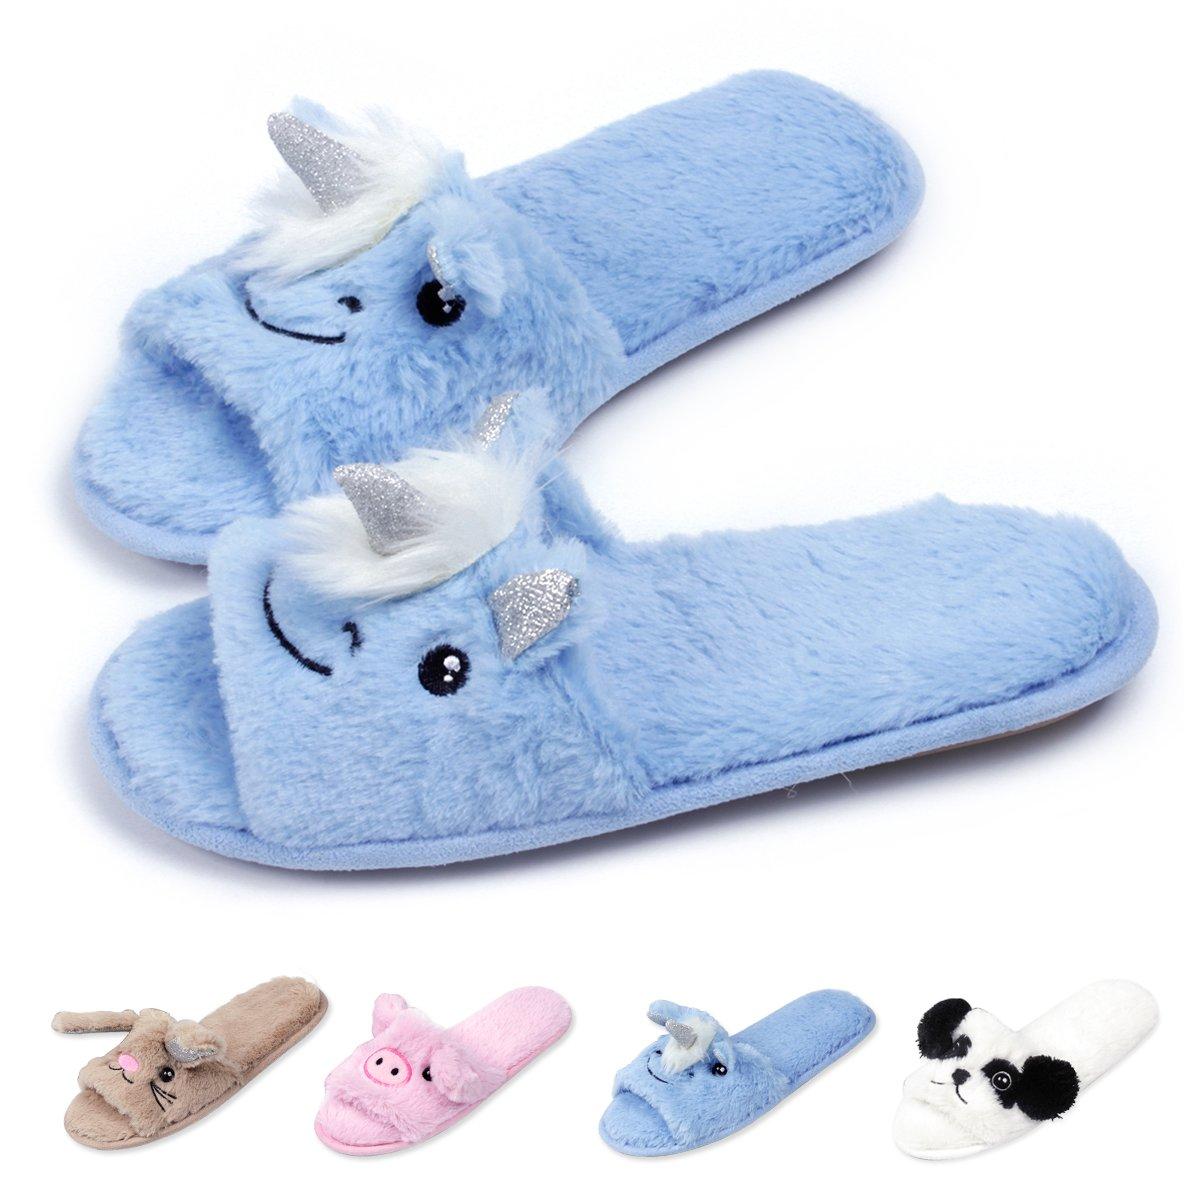 Womens Open Toe Slippers | Cute Bunny Unicorn Animal Slipper | Soft Fleece Memory Foam Clog | Anti-Slip Sole Indoor Outdoor Shoes | Flip Flop Spa Slippers (9-10, BlueUnicorn)